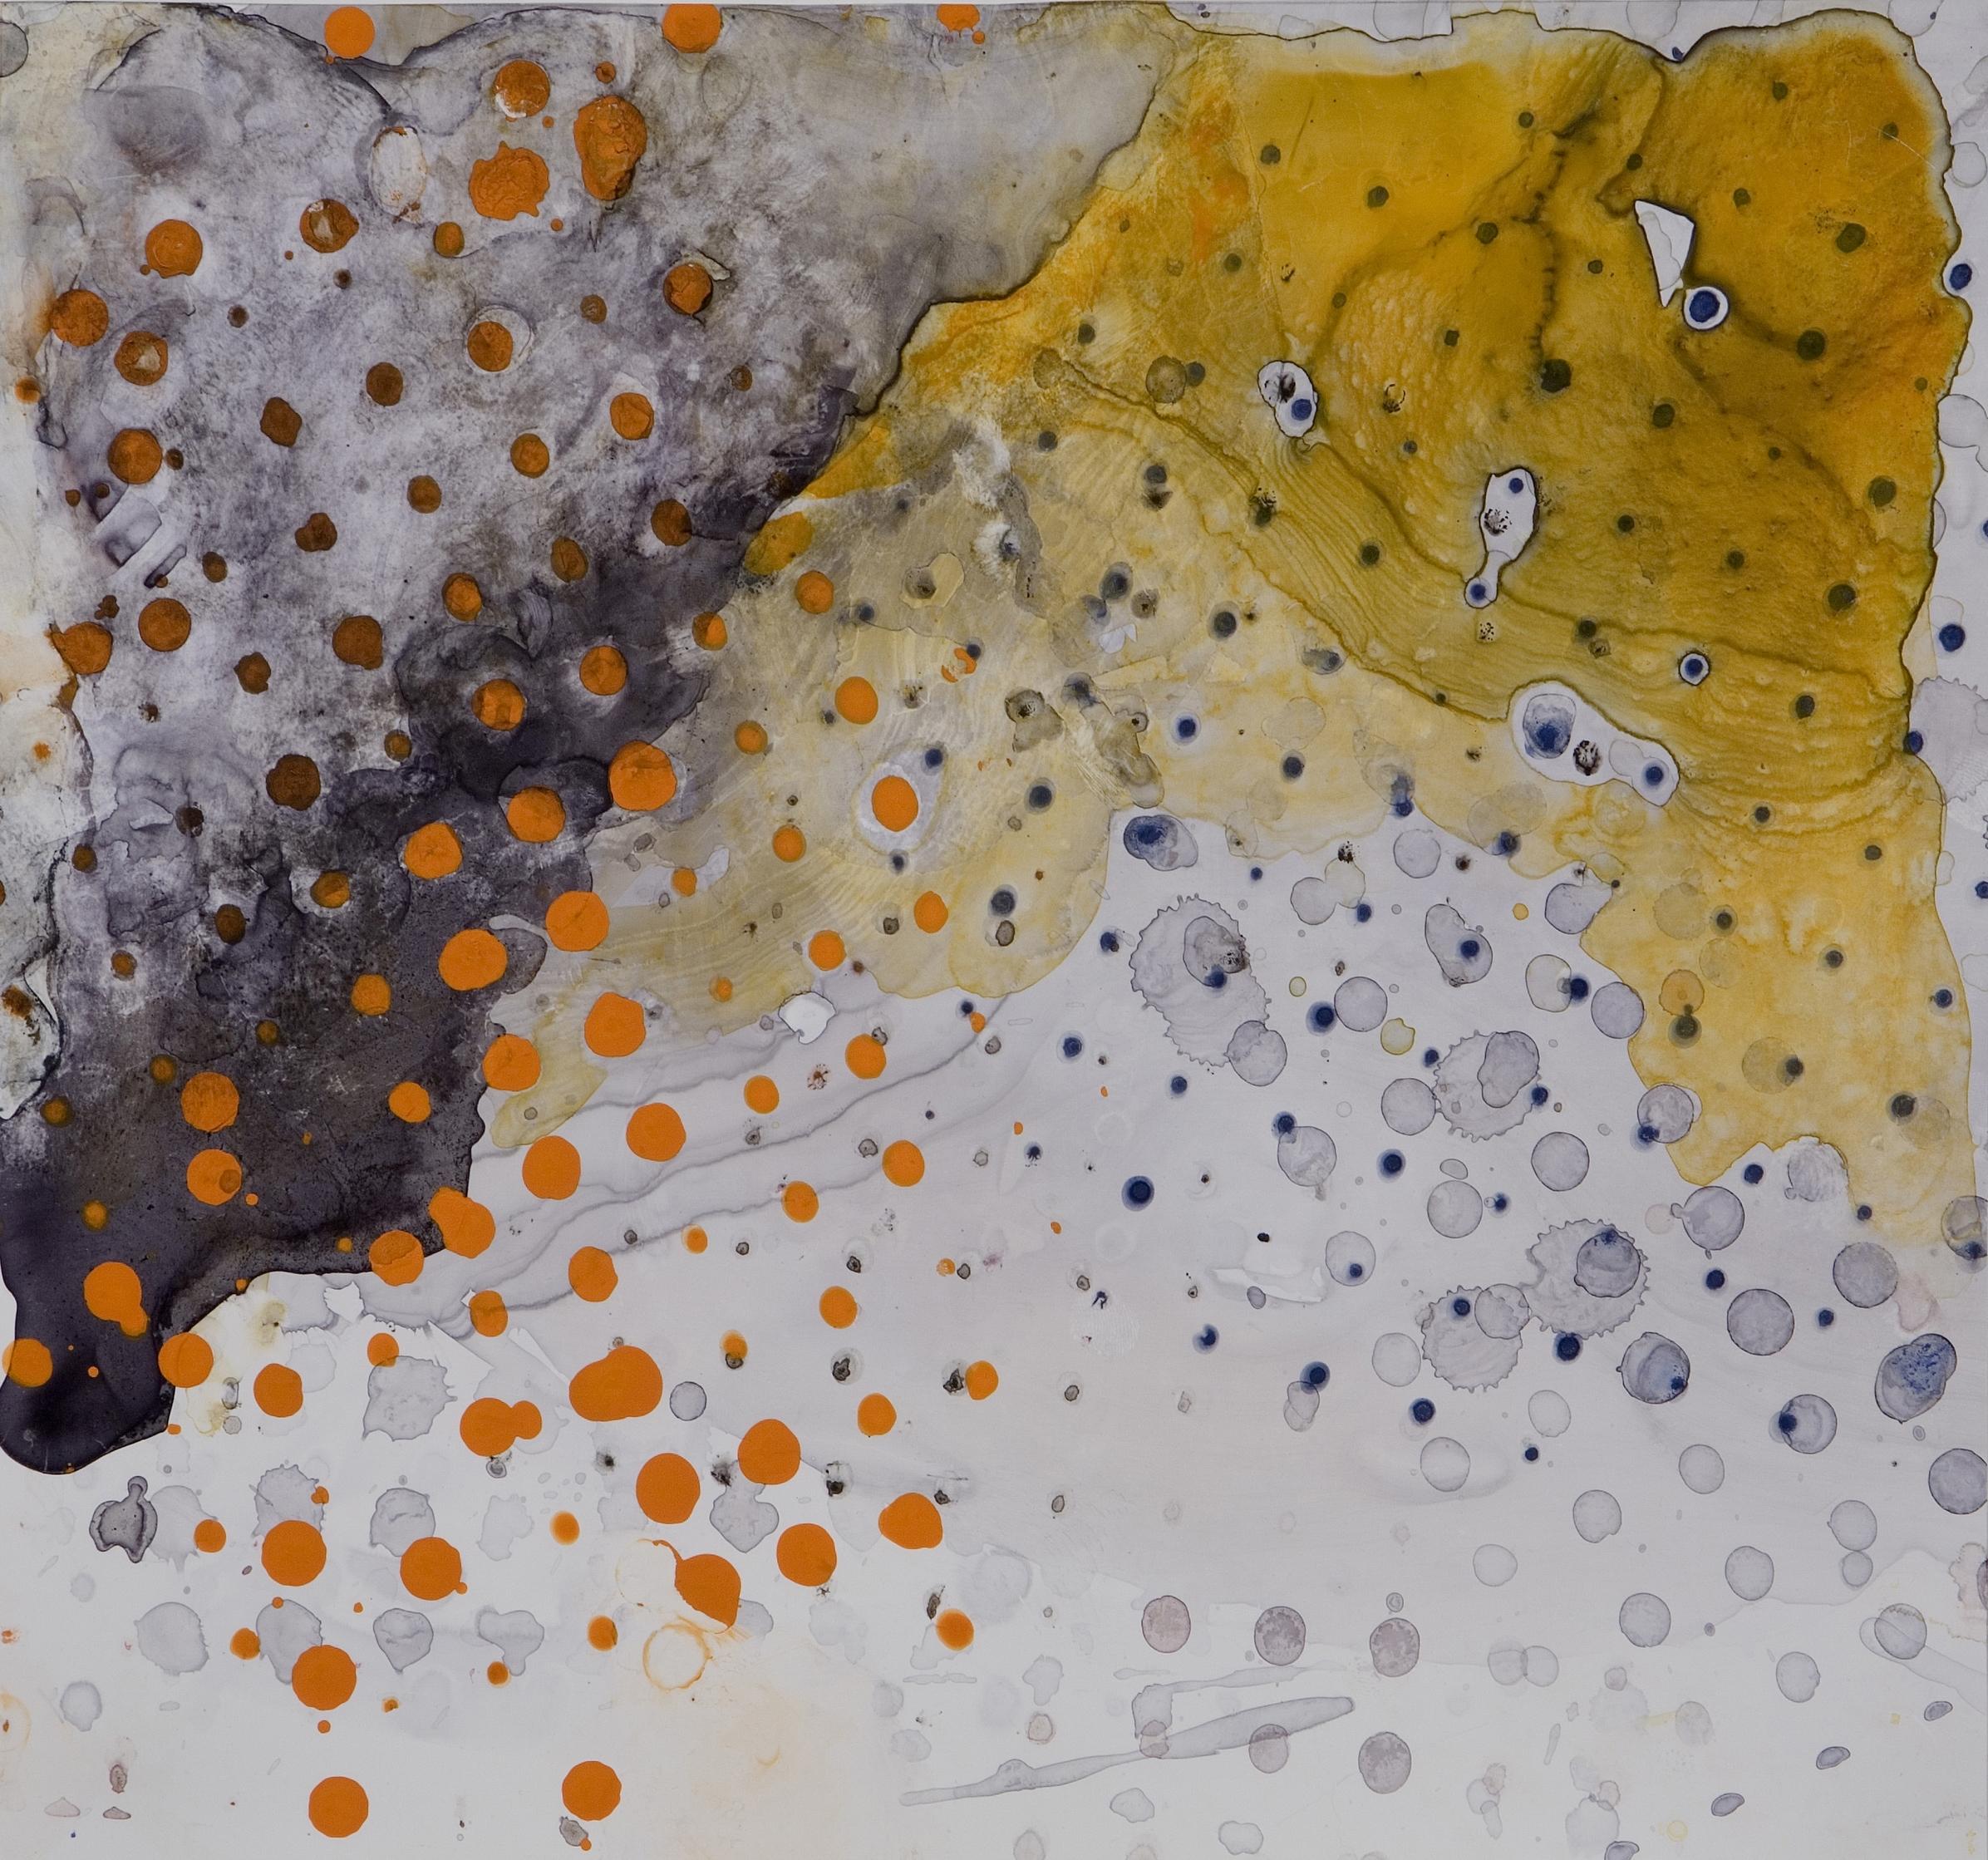 "Sanskriti Series #5, watercolor and casein, 12"" x 13"", 2007"